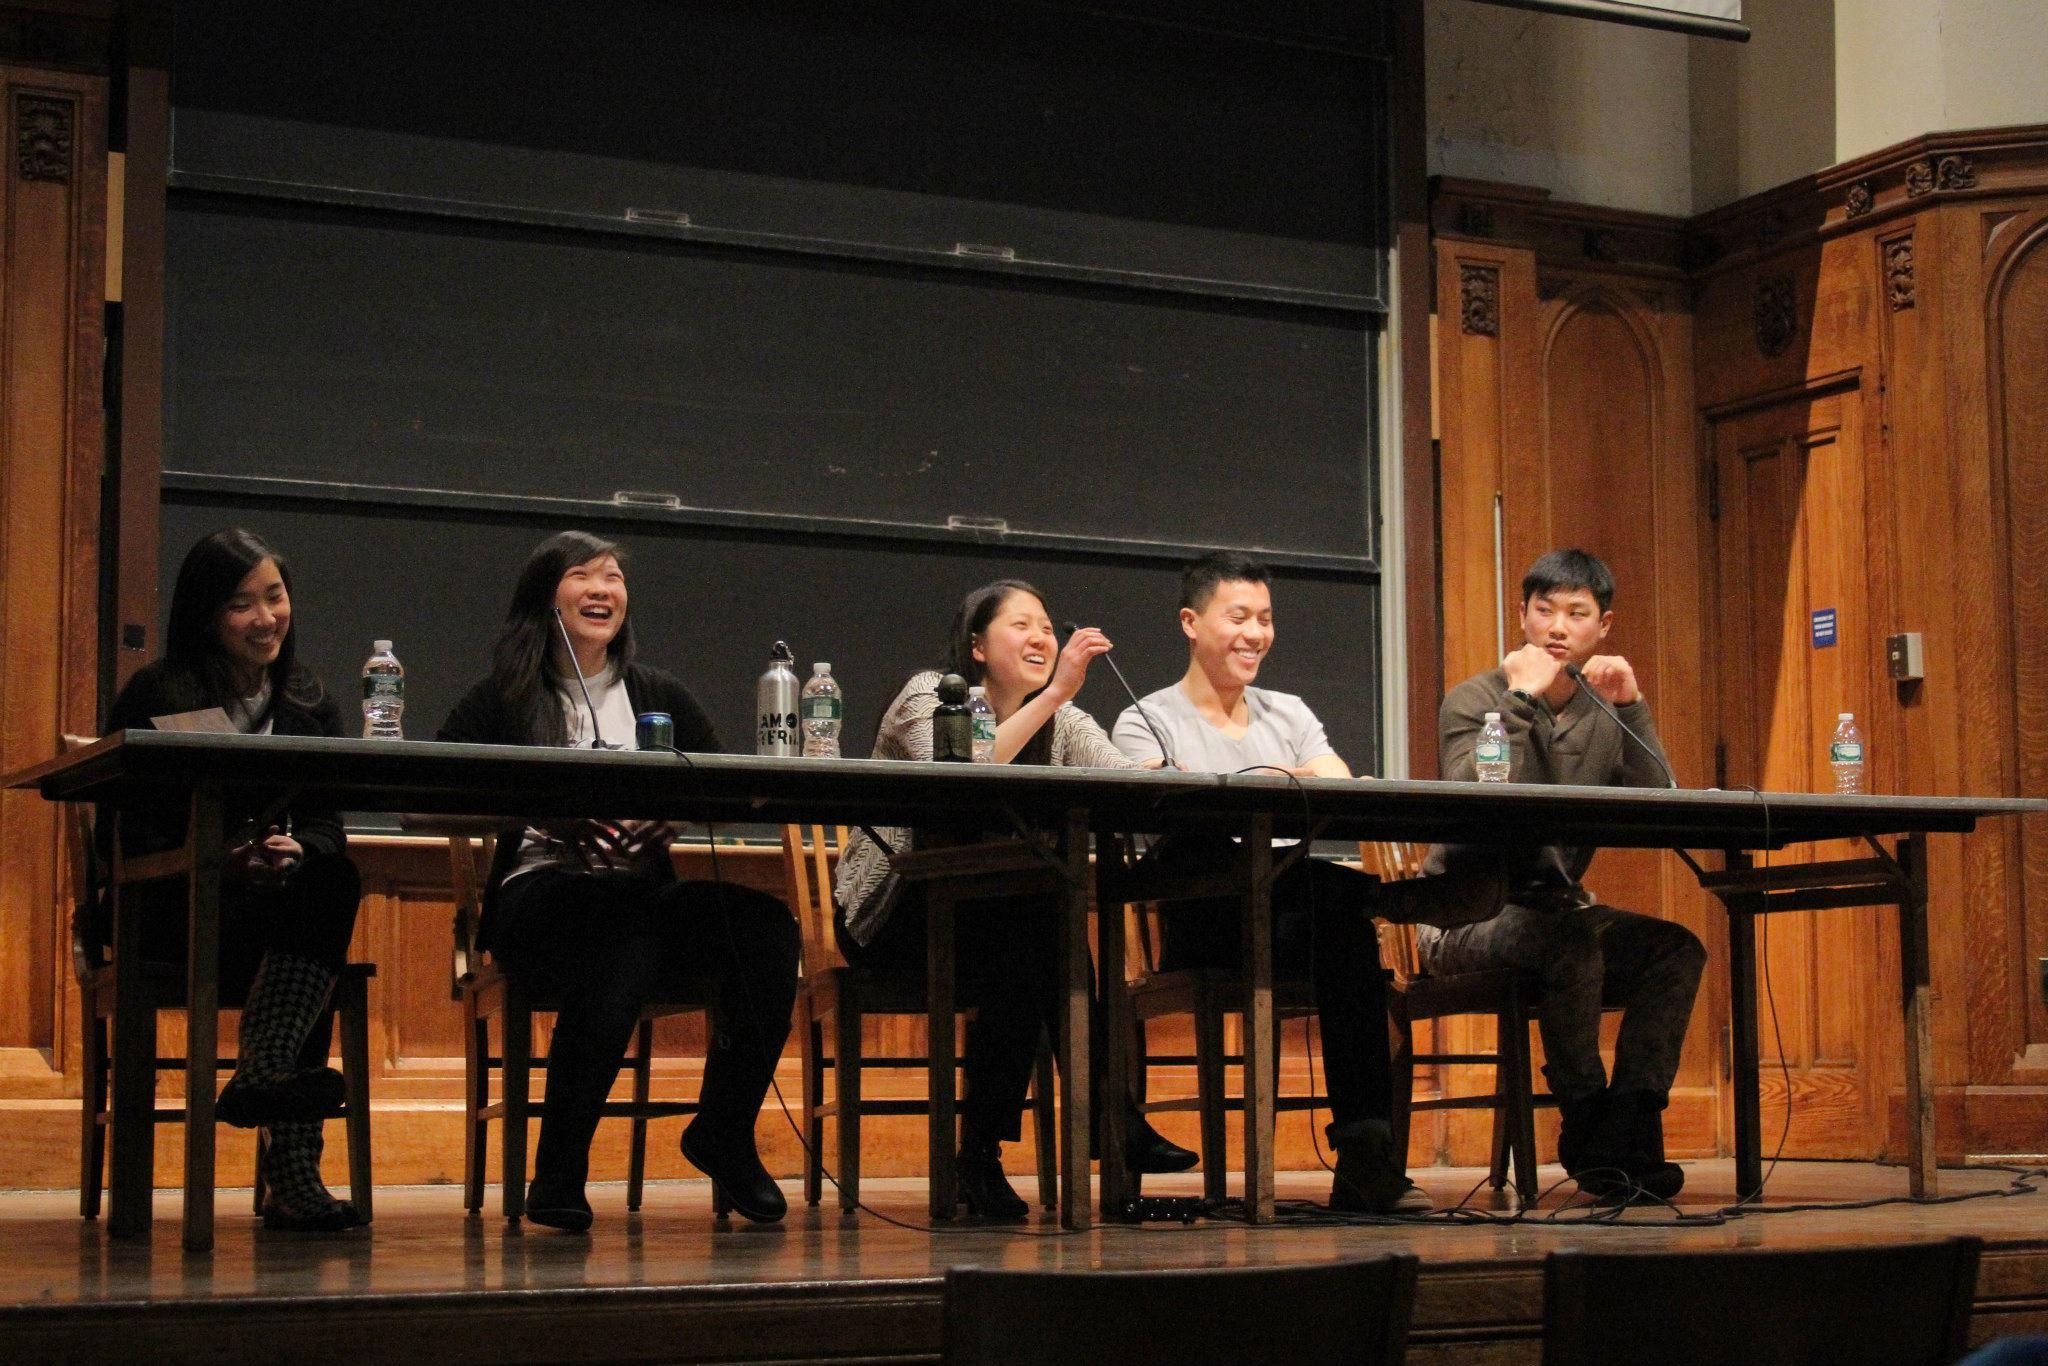 ITASA East Coast Conference 2014 panel